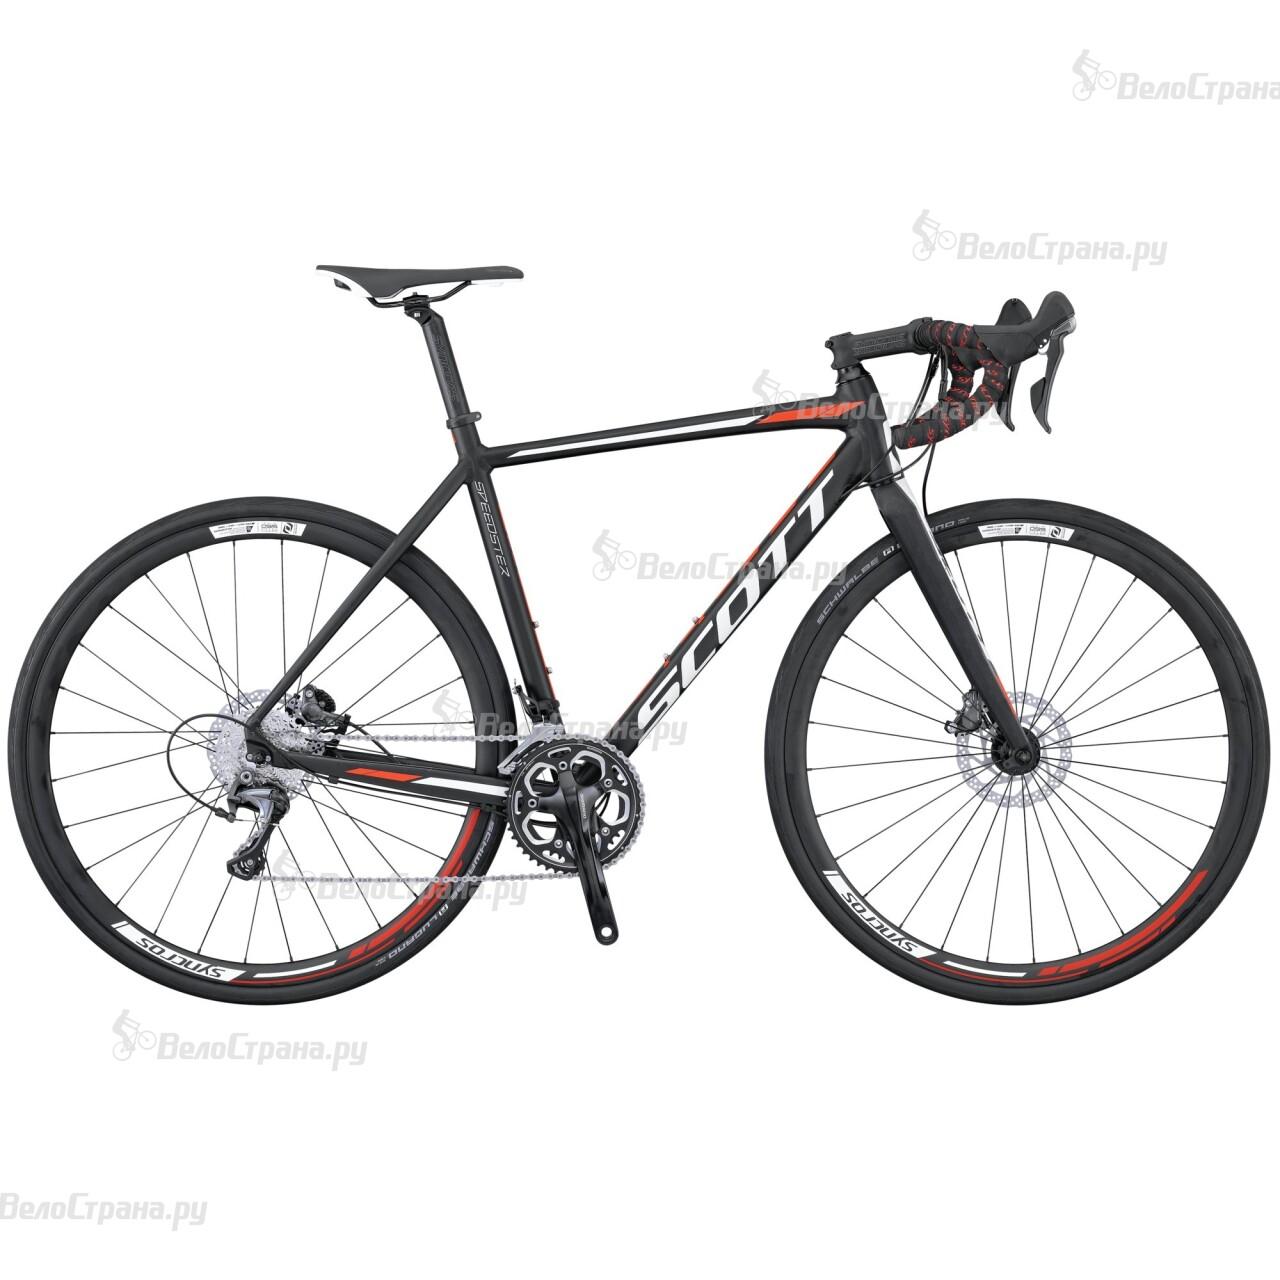 Велосипед Scott Speedster 20 Disc (2016) отсутствует opel speedster